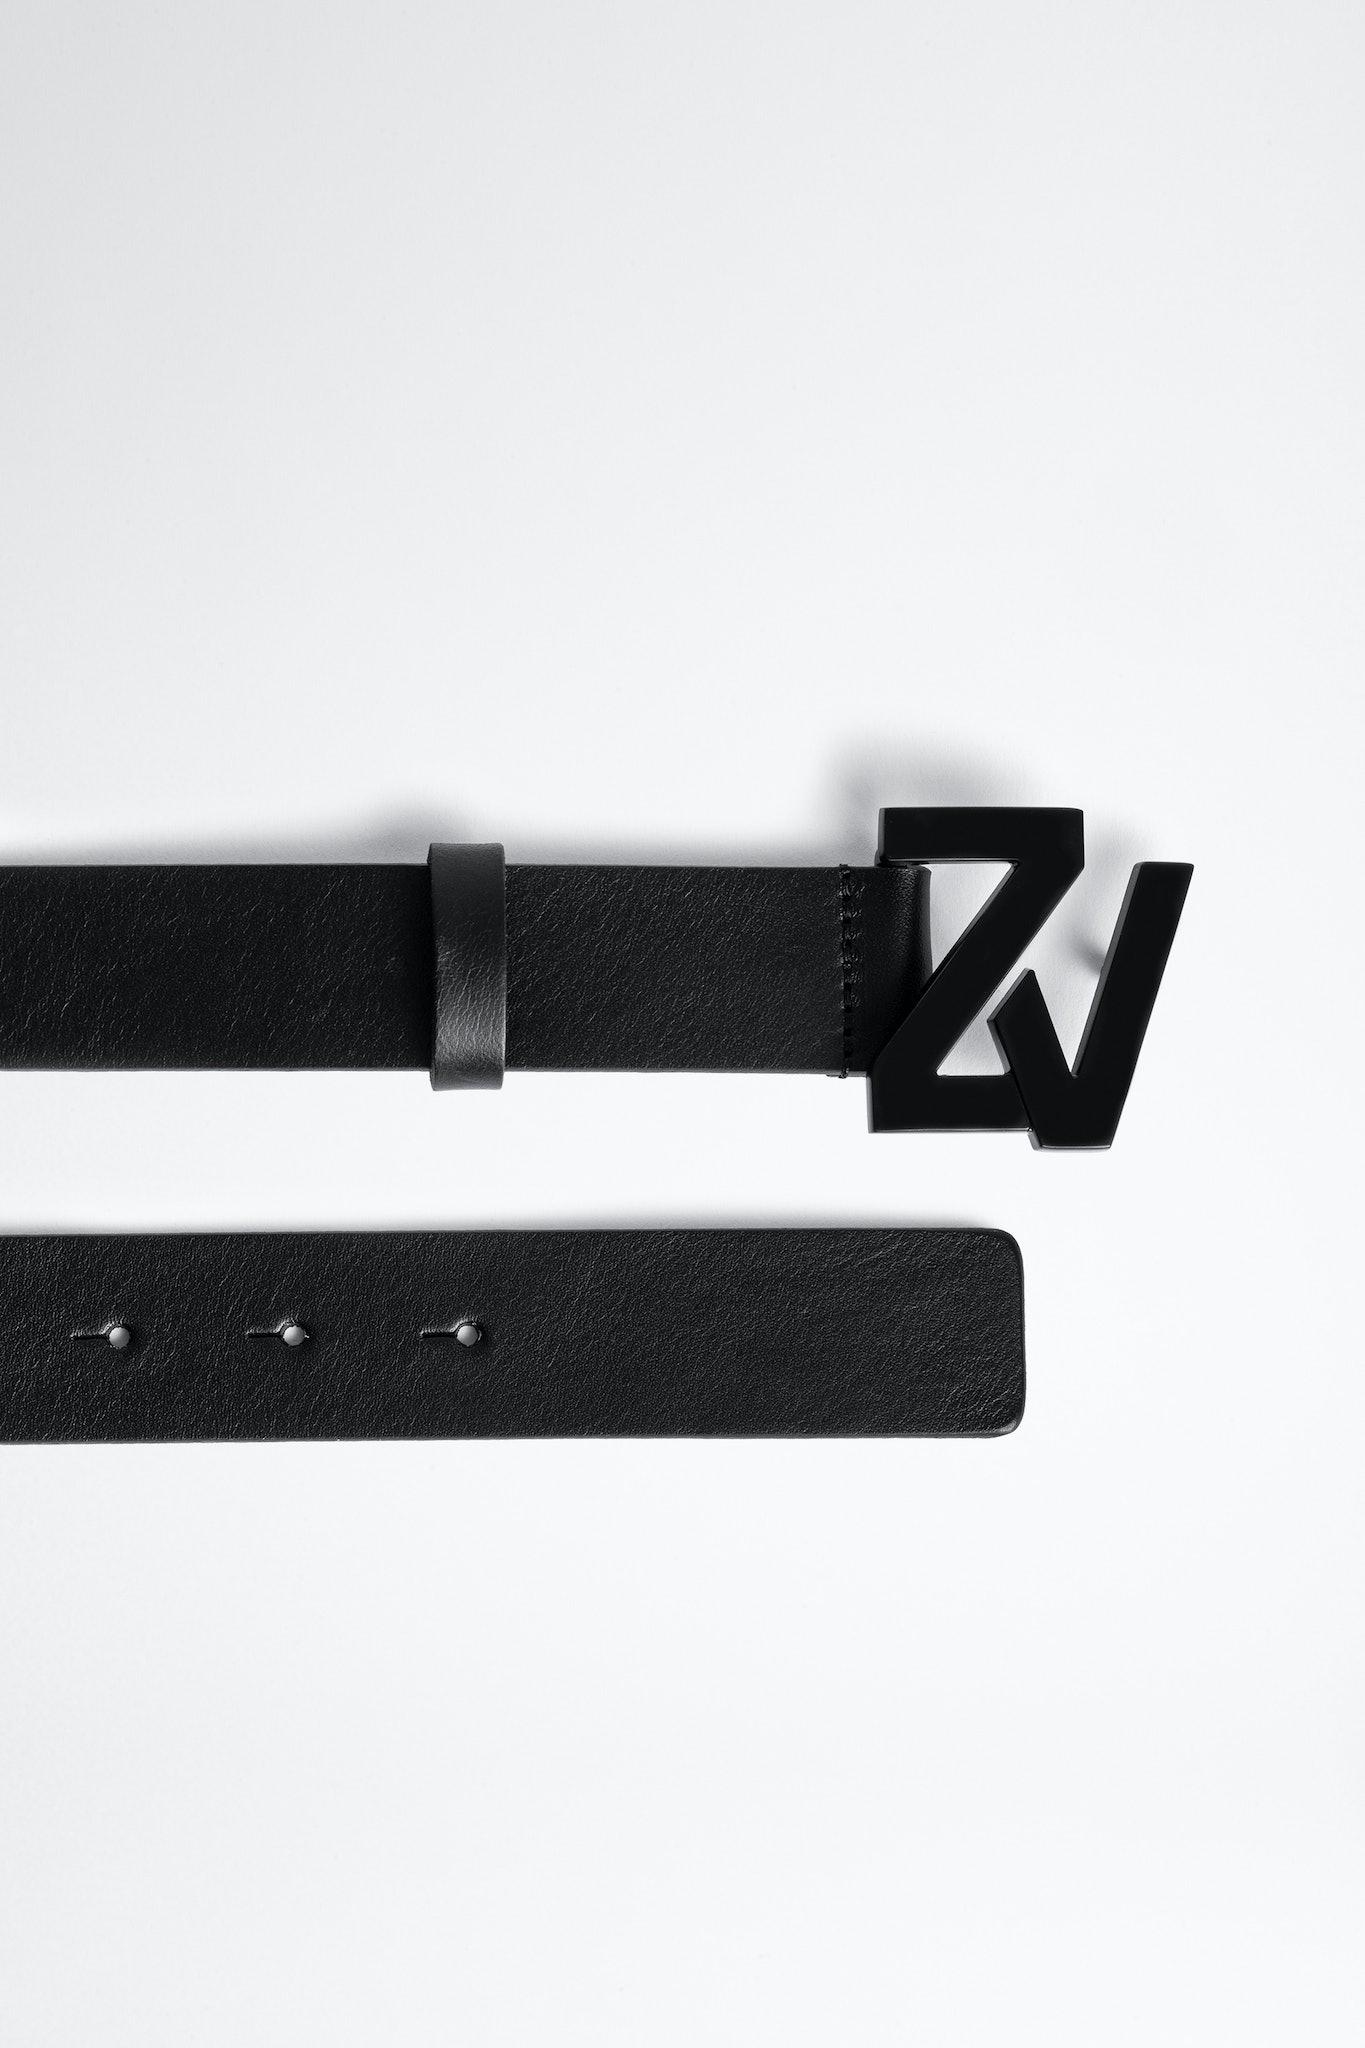 Cintura ZV Initiale